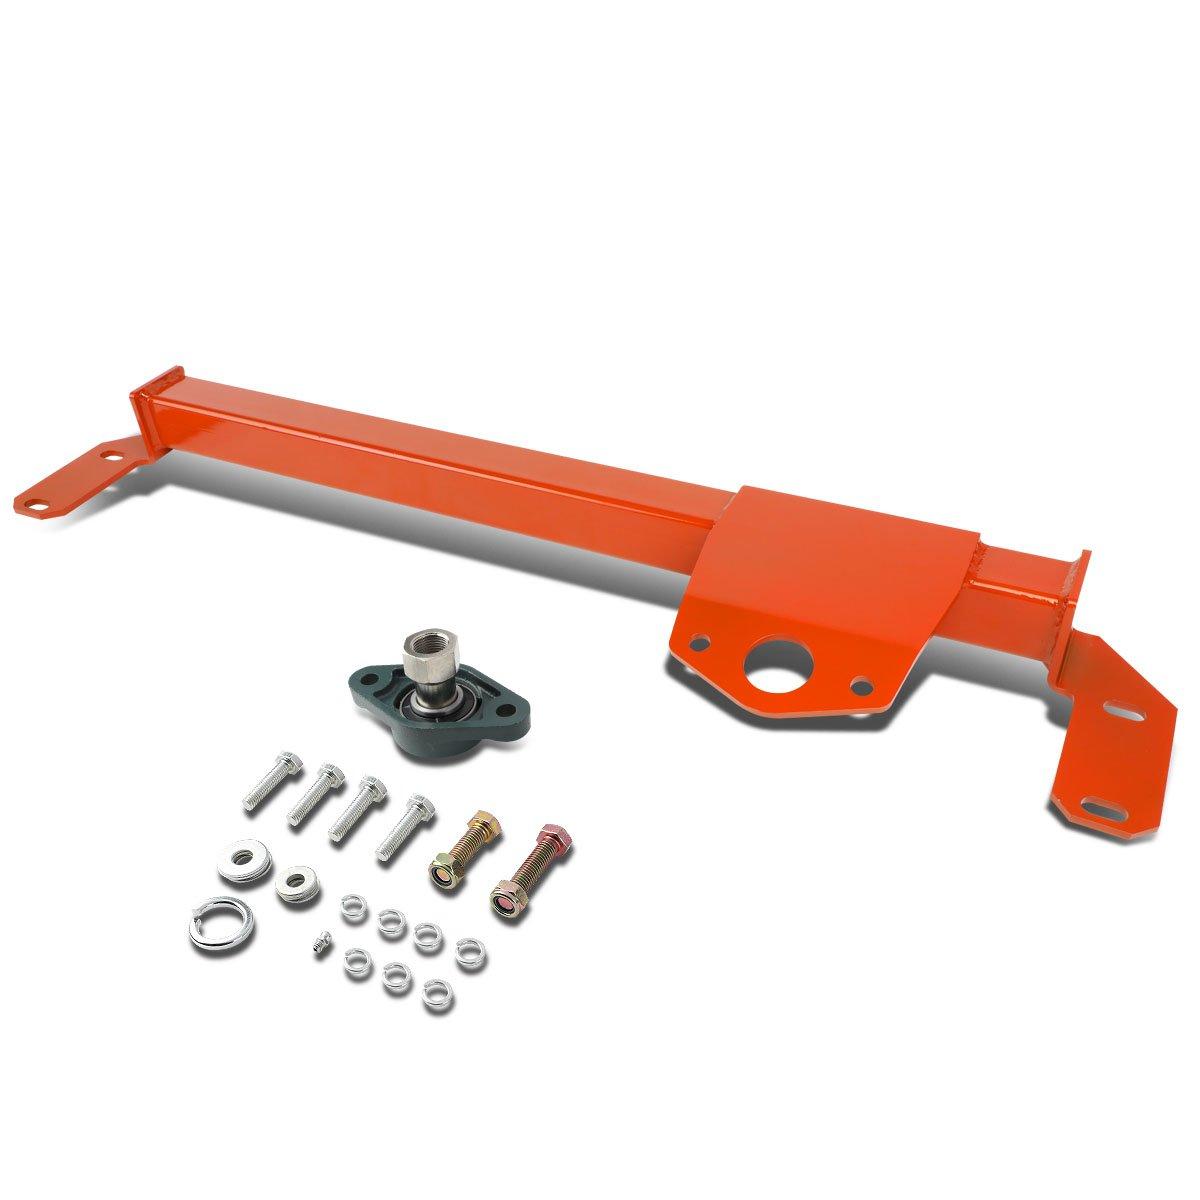 For Dodge Ram 2500 3500 4WD AWD Mild Steel Steering Gear Box Stabilizer Brace//Bar Red Type 3